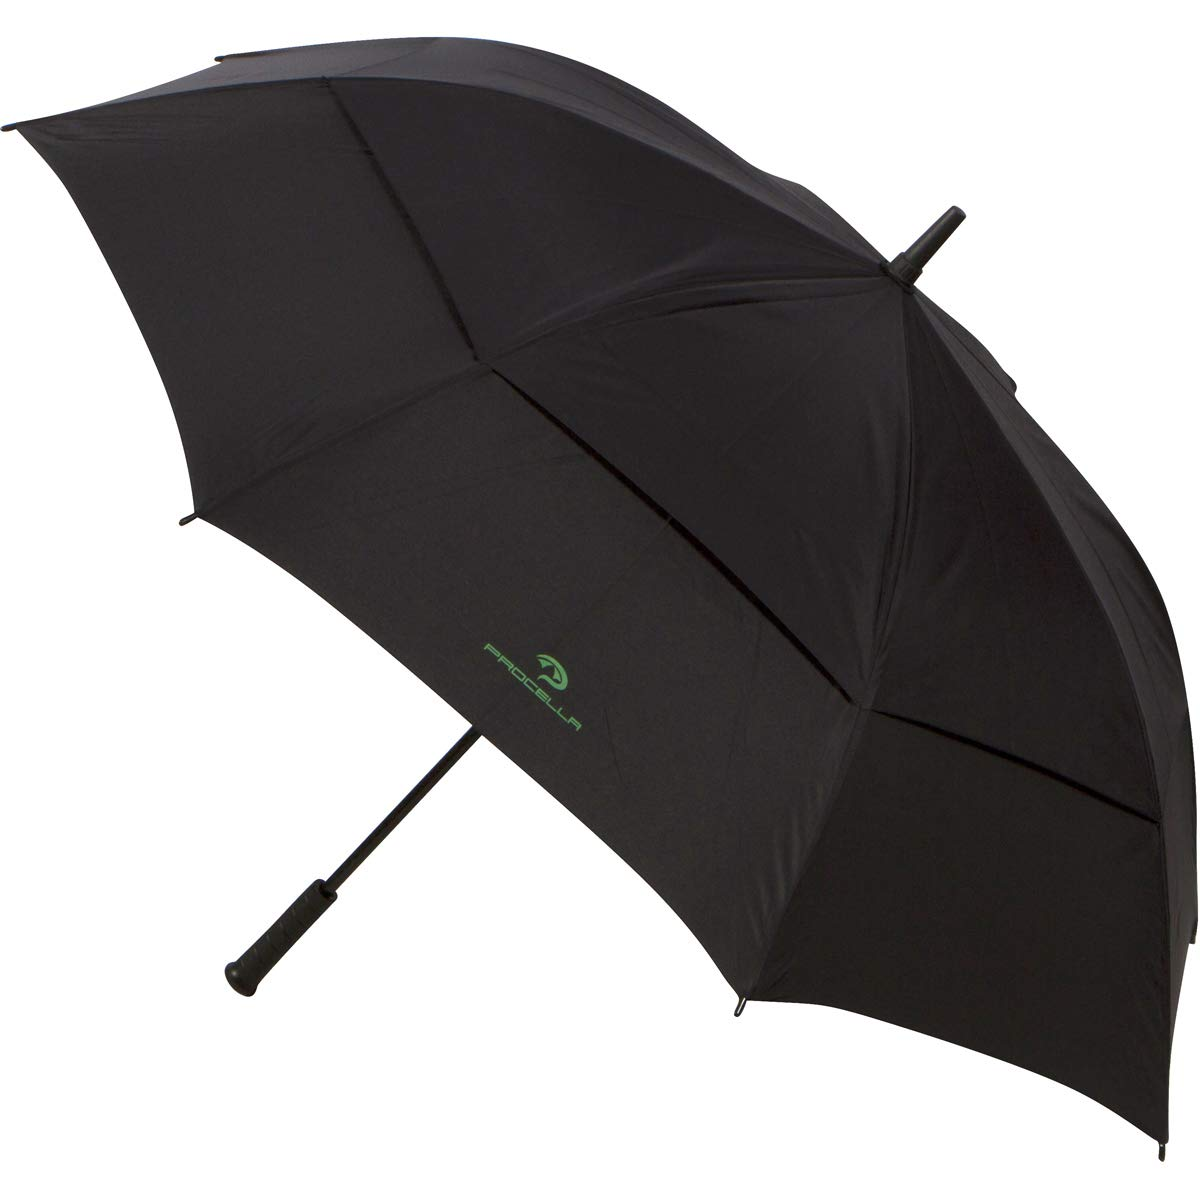 b7714cc17ea6 Best Rated in Golf Umbrellas & Helpful Customer Reviews - Amazon.co.uk